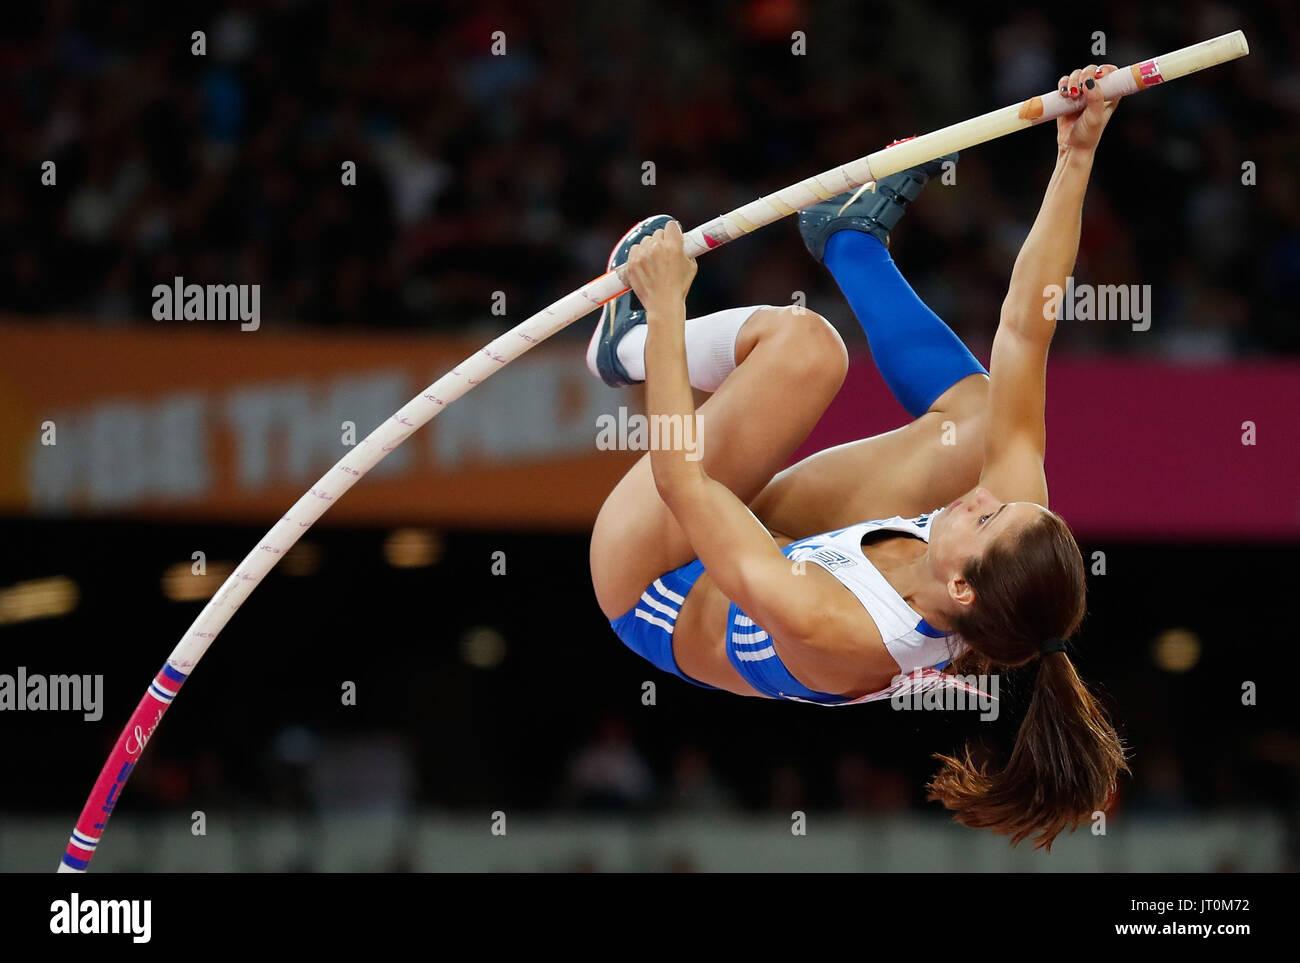 European U Championships Womens Pole Vault Final